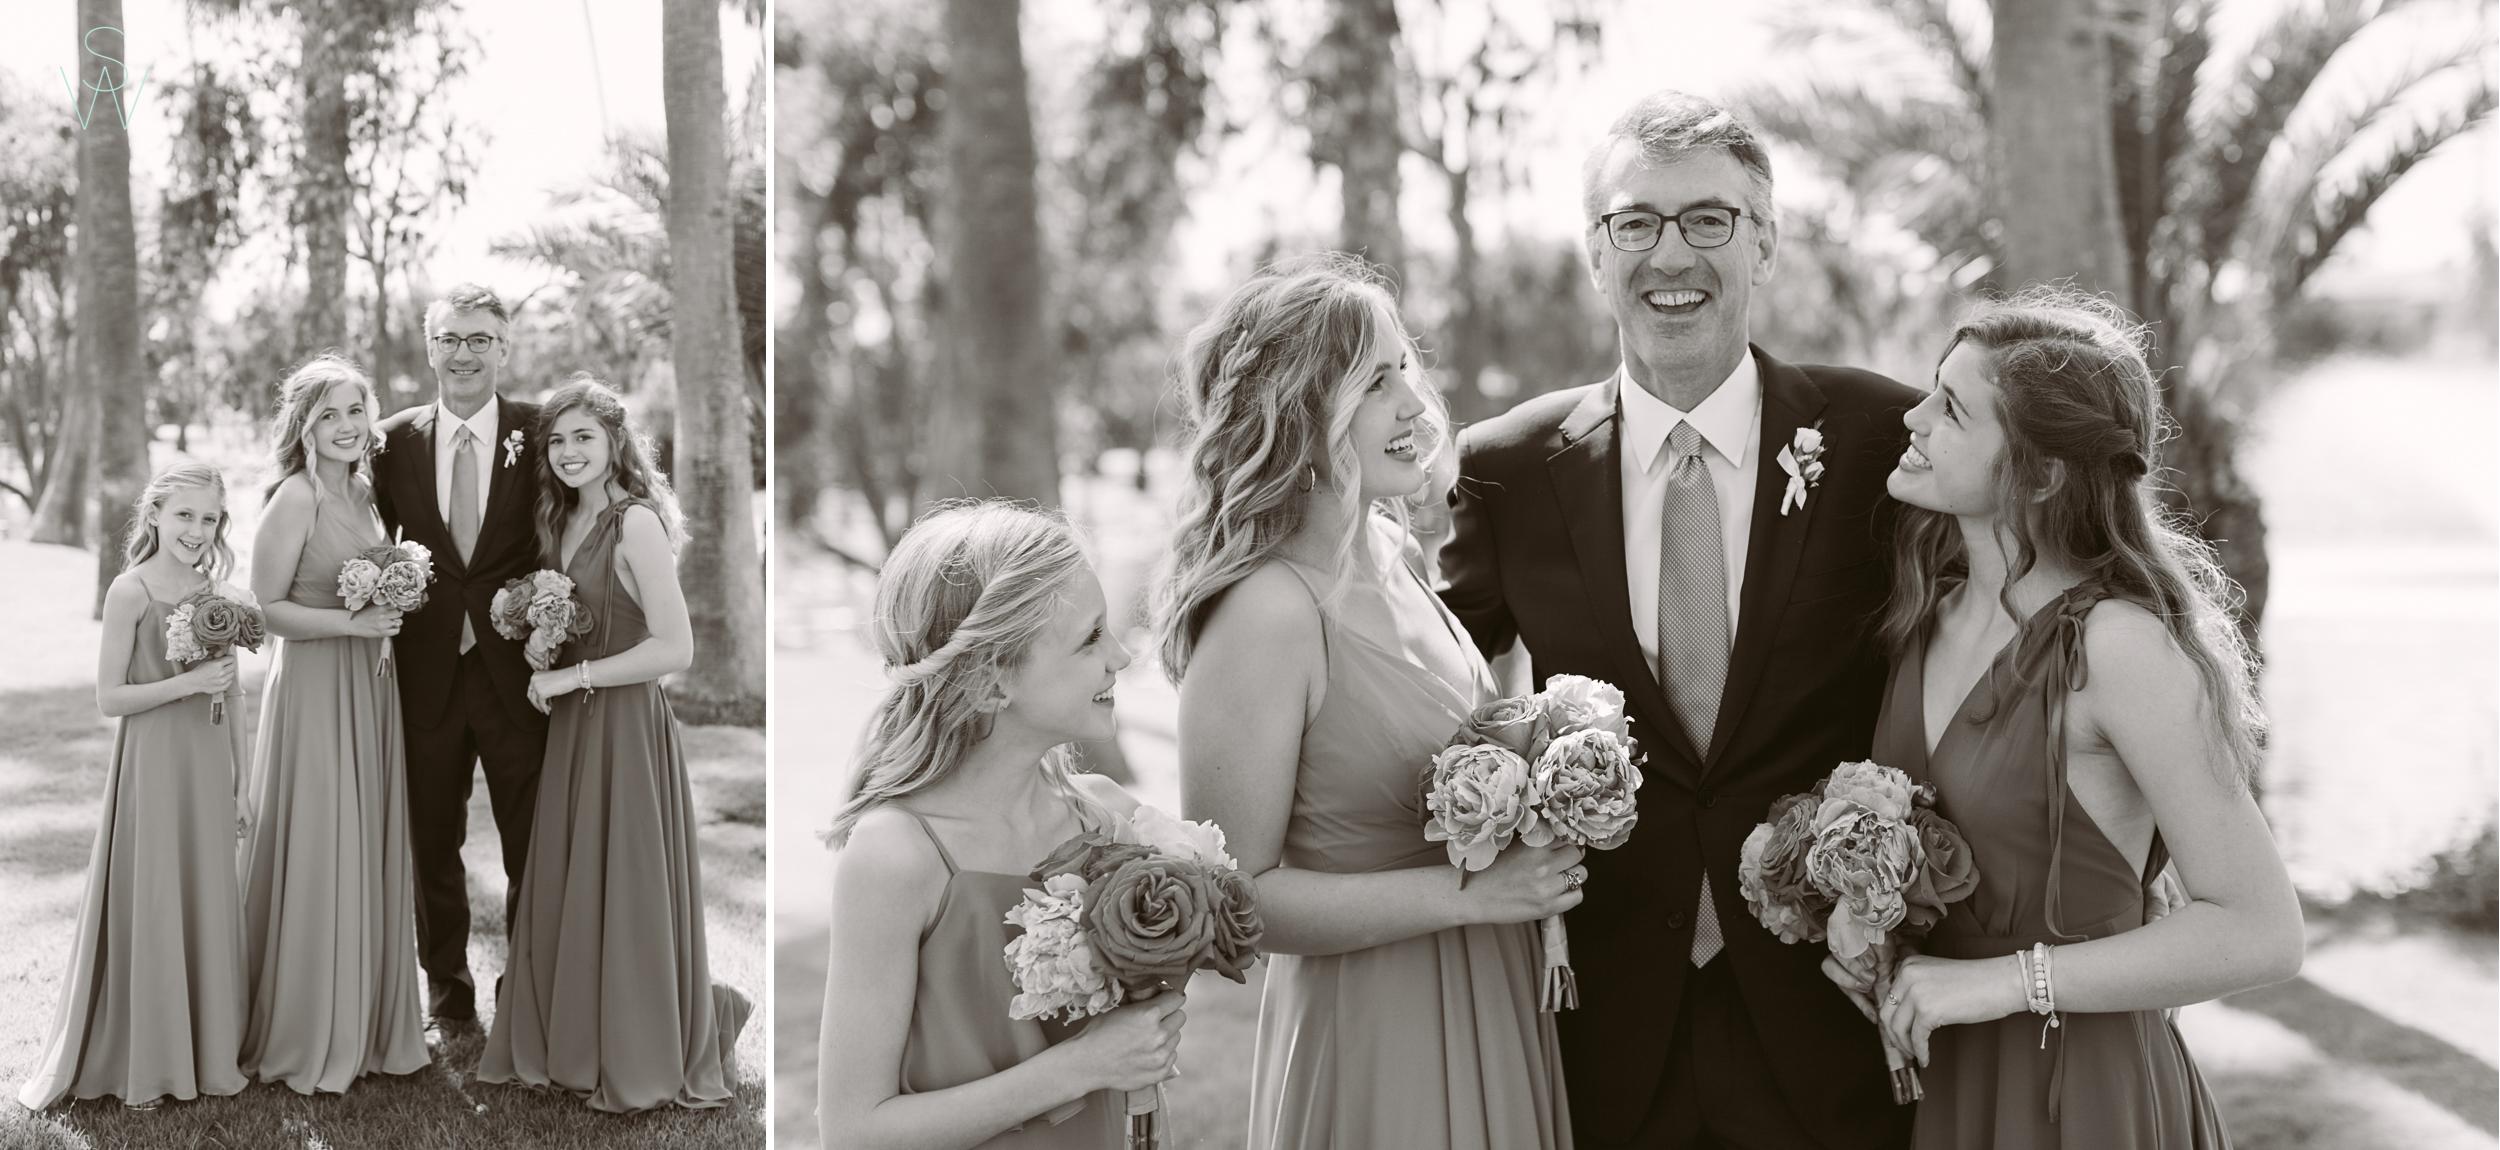 shewanders.wedding.photography.la.jolla-1019.jpg